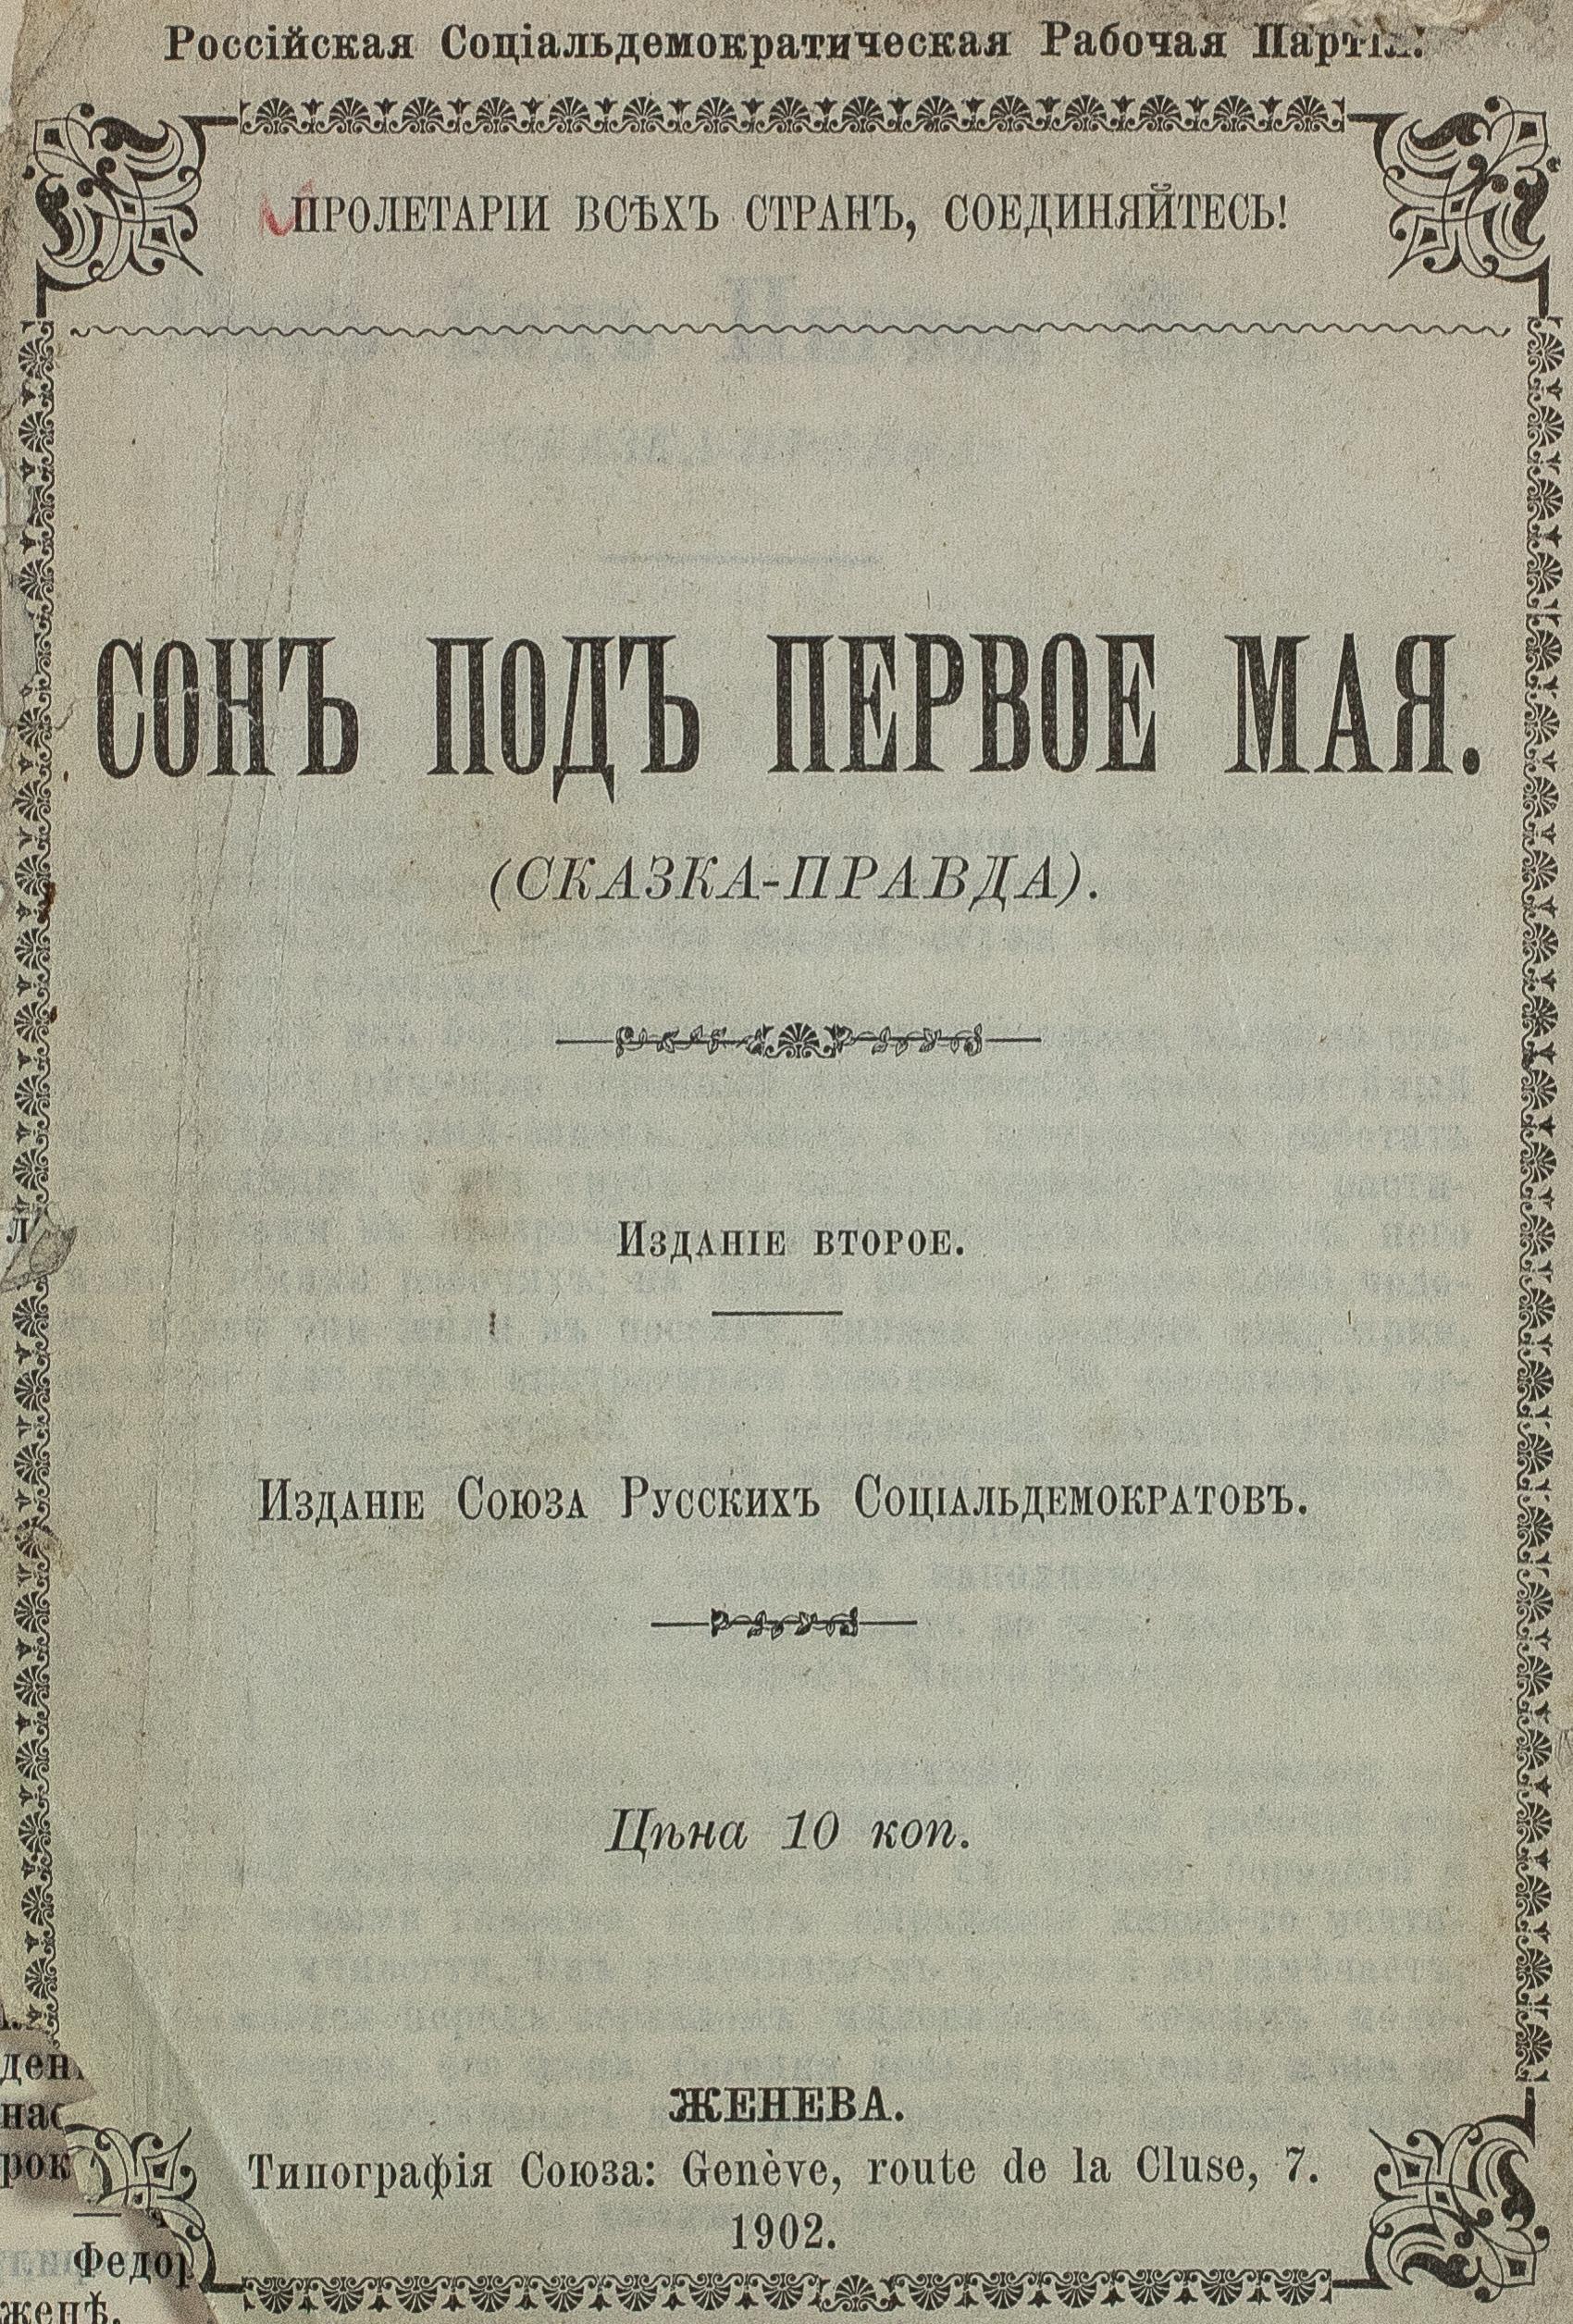 Lot 469 - KOUSKOVA, Ékaterina. Un rêve la veille du 1er Mai. Genève, 1902. [...]